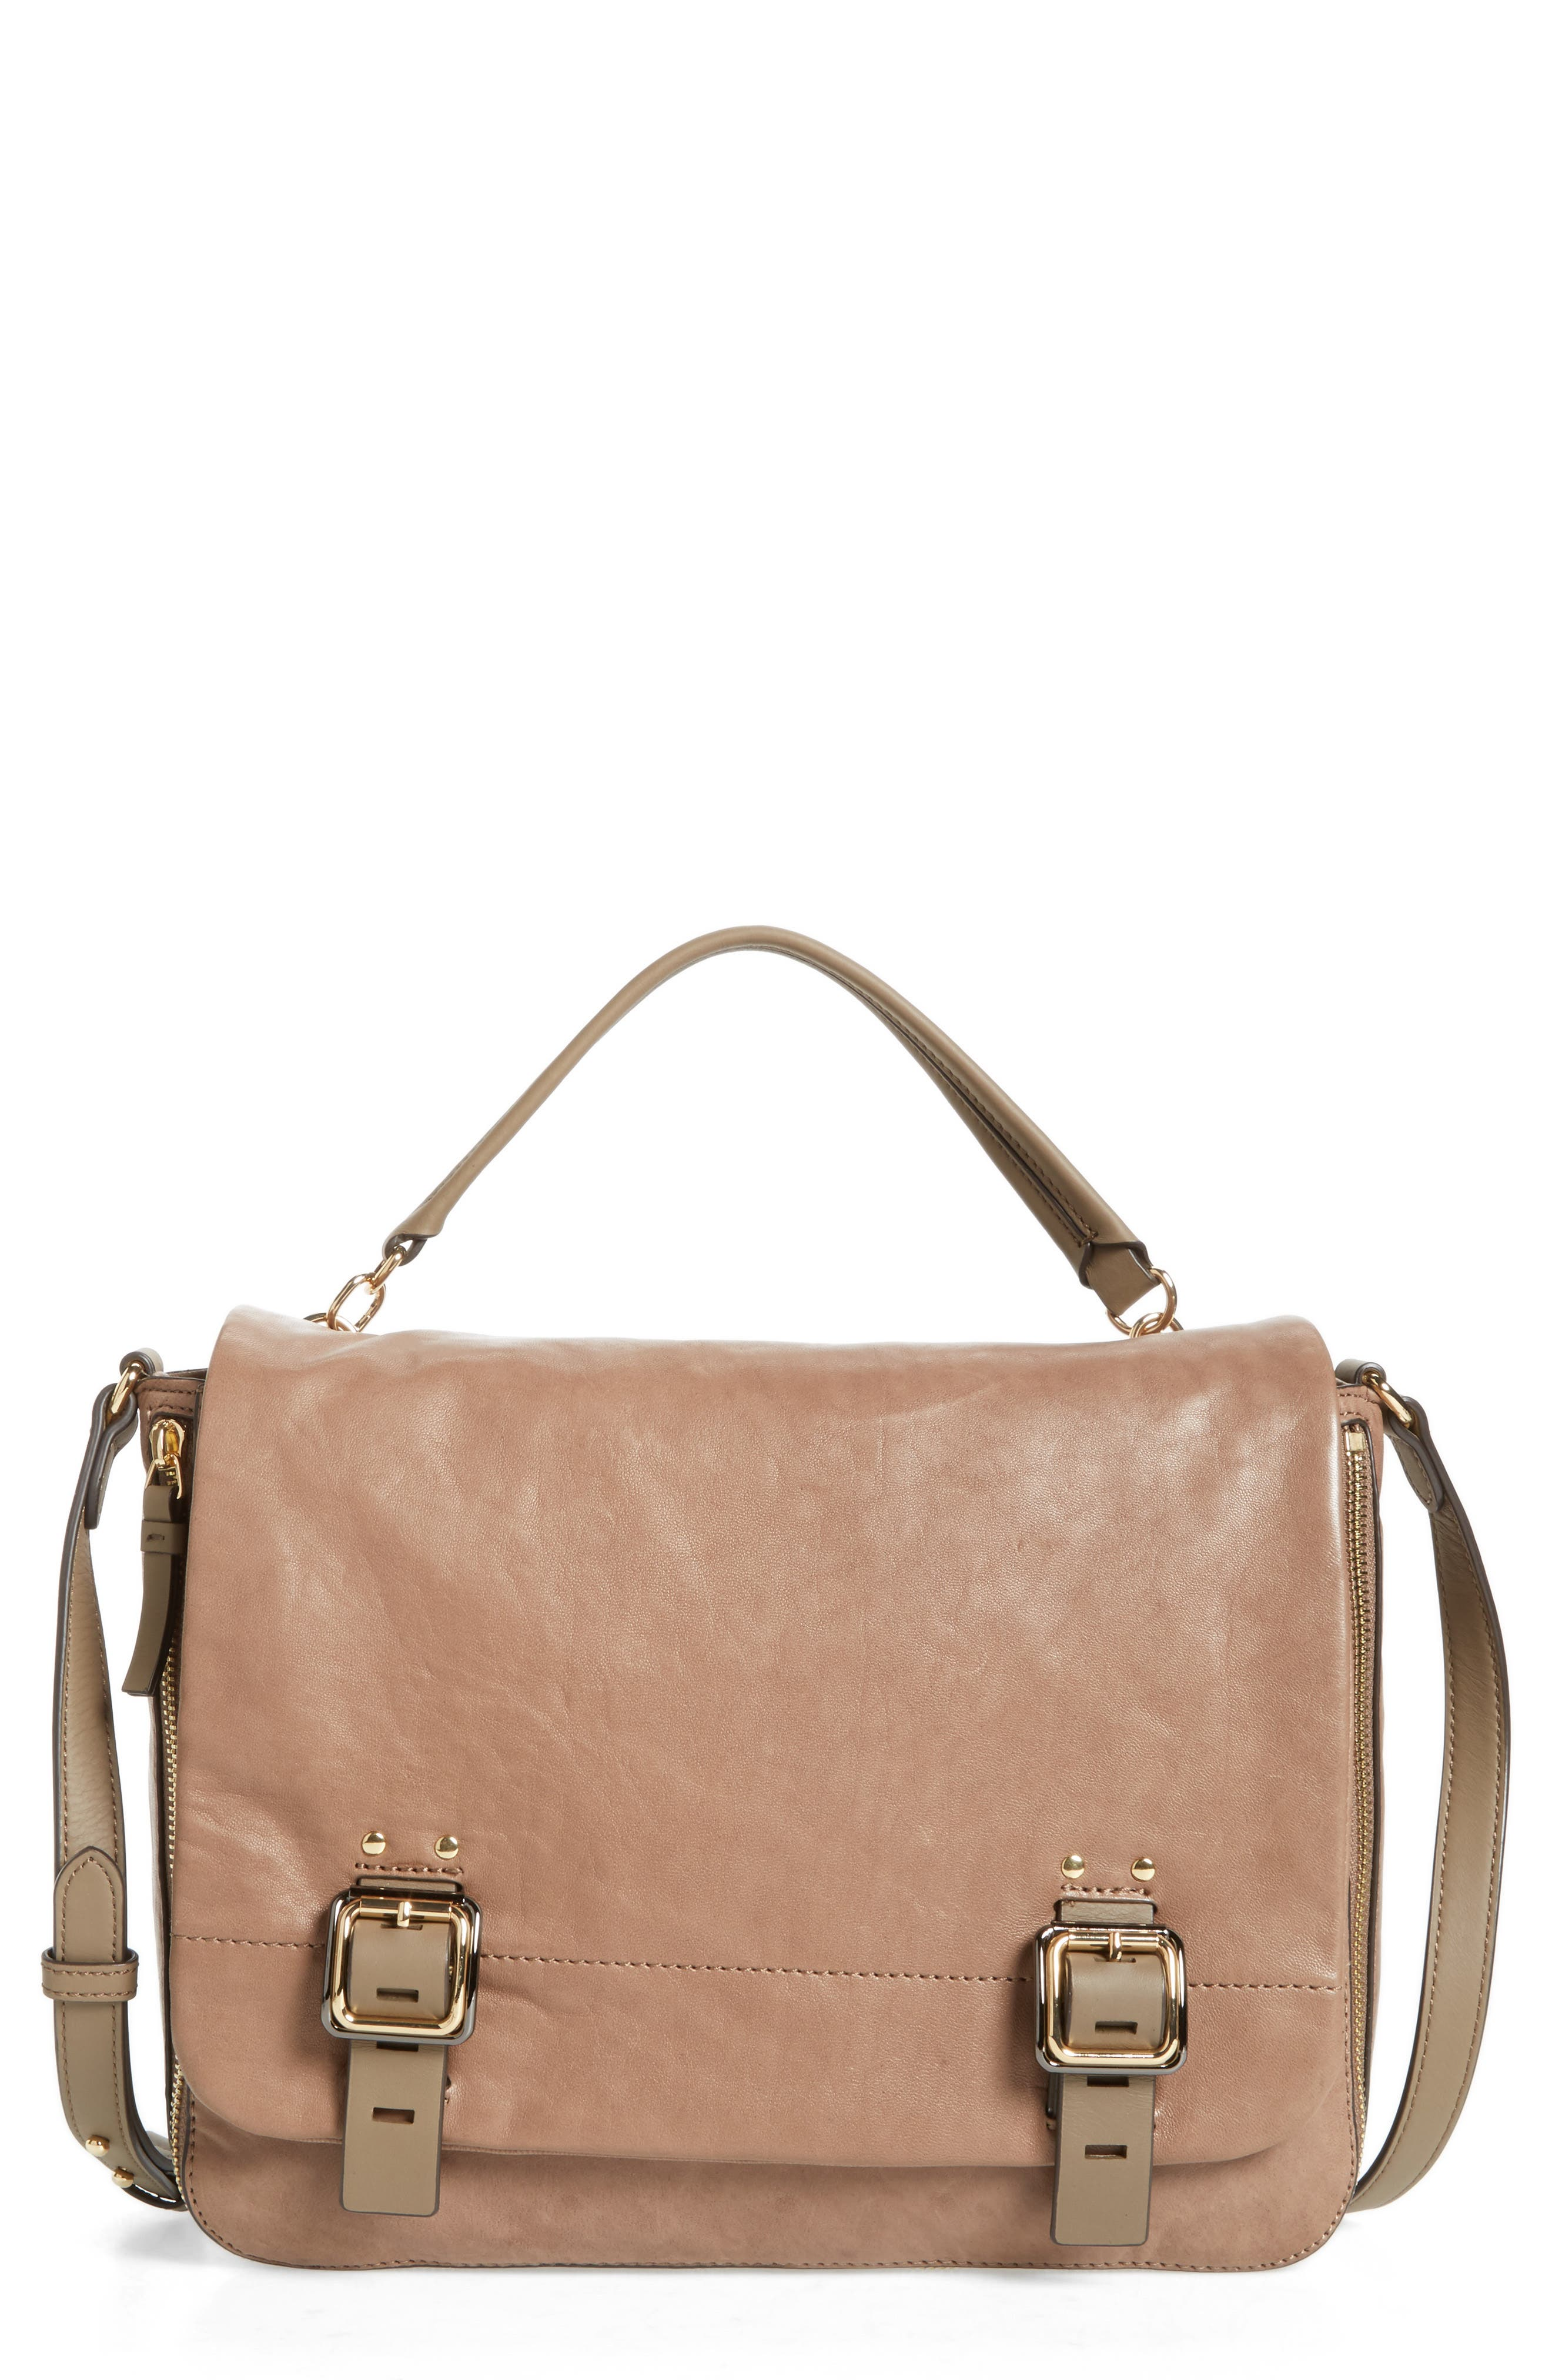 Alternate Image 1 Selected - Vince Camuto Delos Leather Messenger Bag (Nordstrom Exclusive)